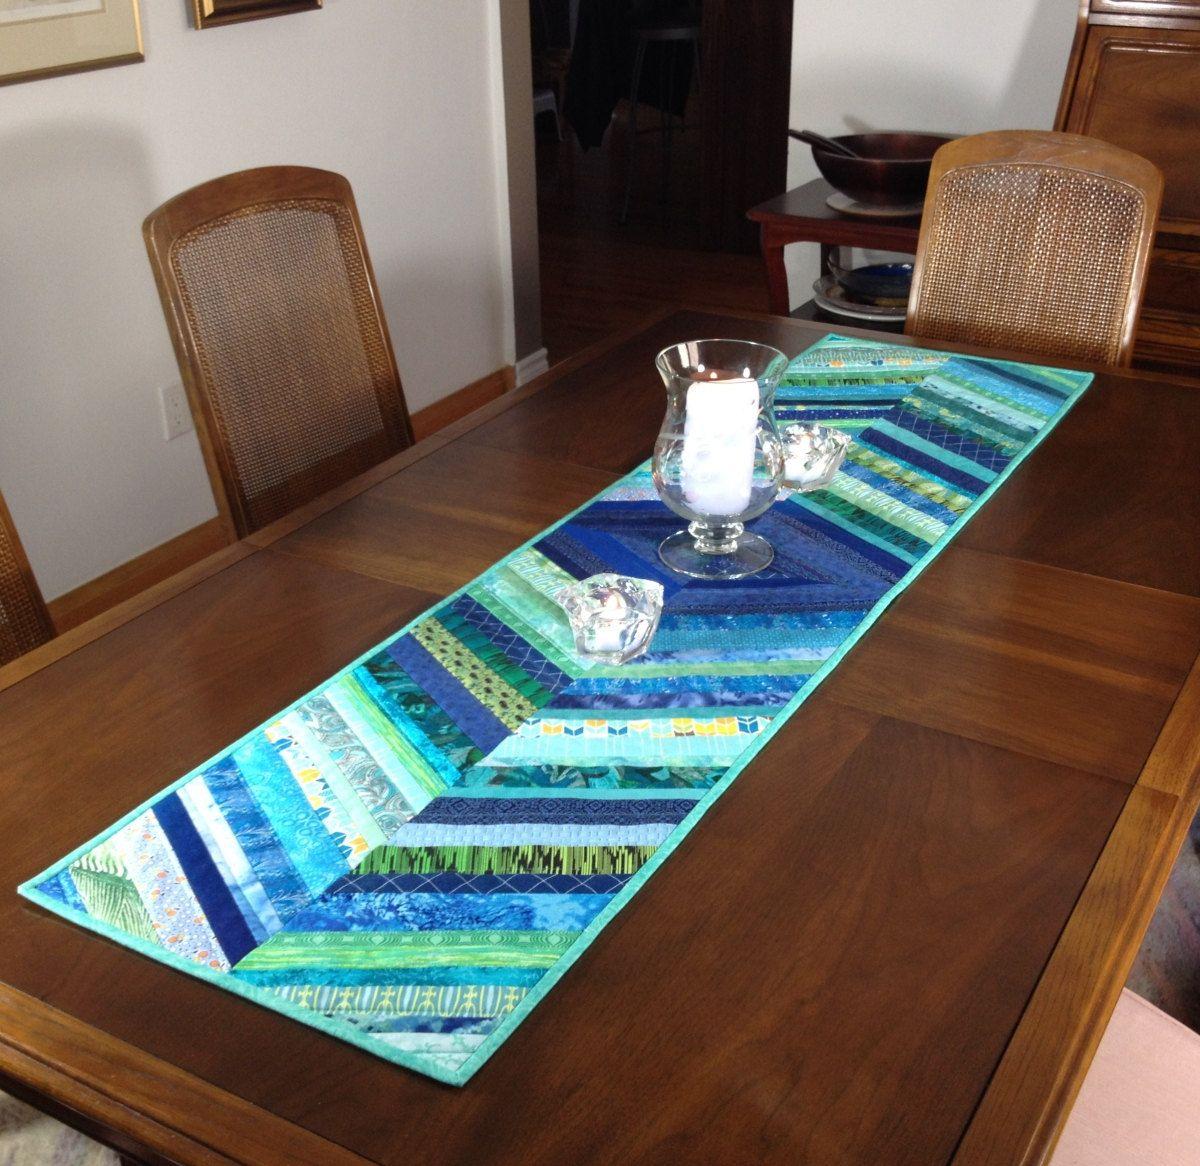 Long Quilted Table Runner, Blue/Green Wallhanging, Bed Runner, Quilted Tablerunner, Modern Table Decor, Reversible Table Runner